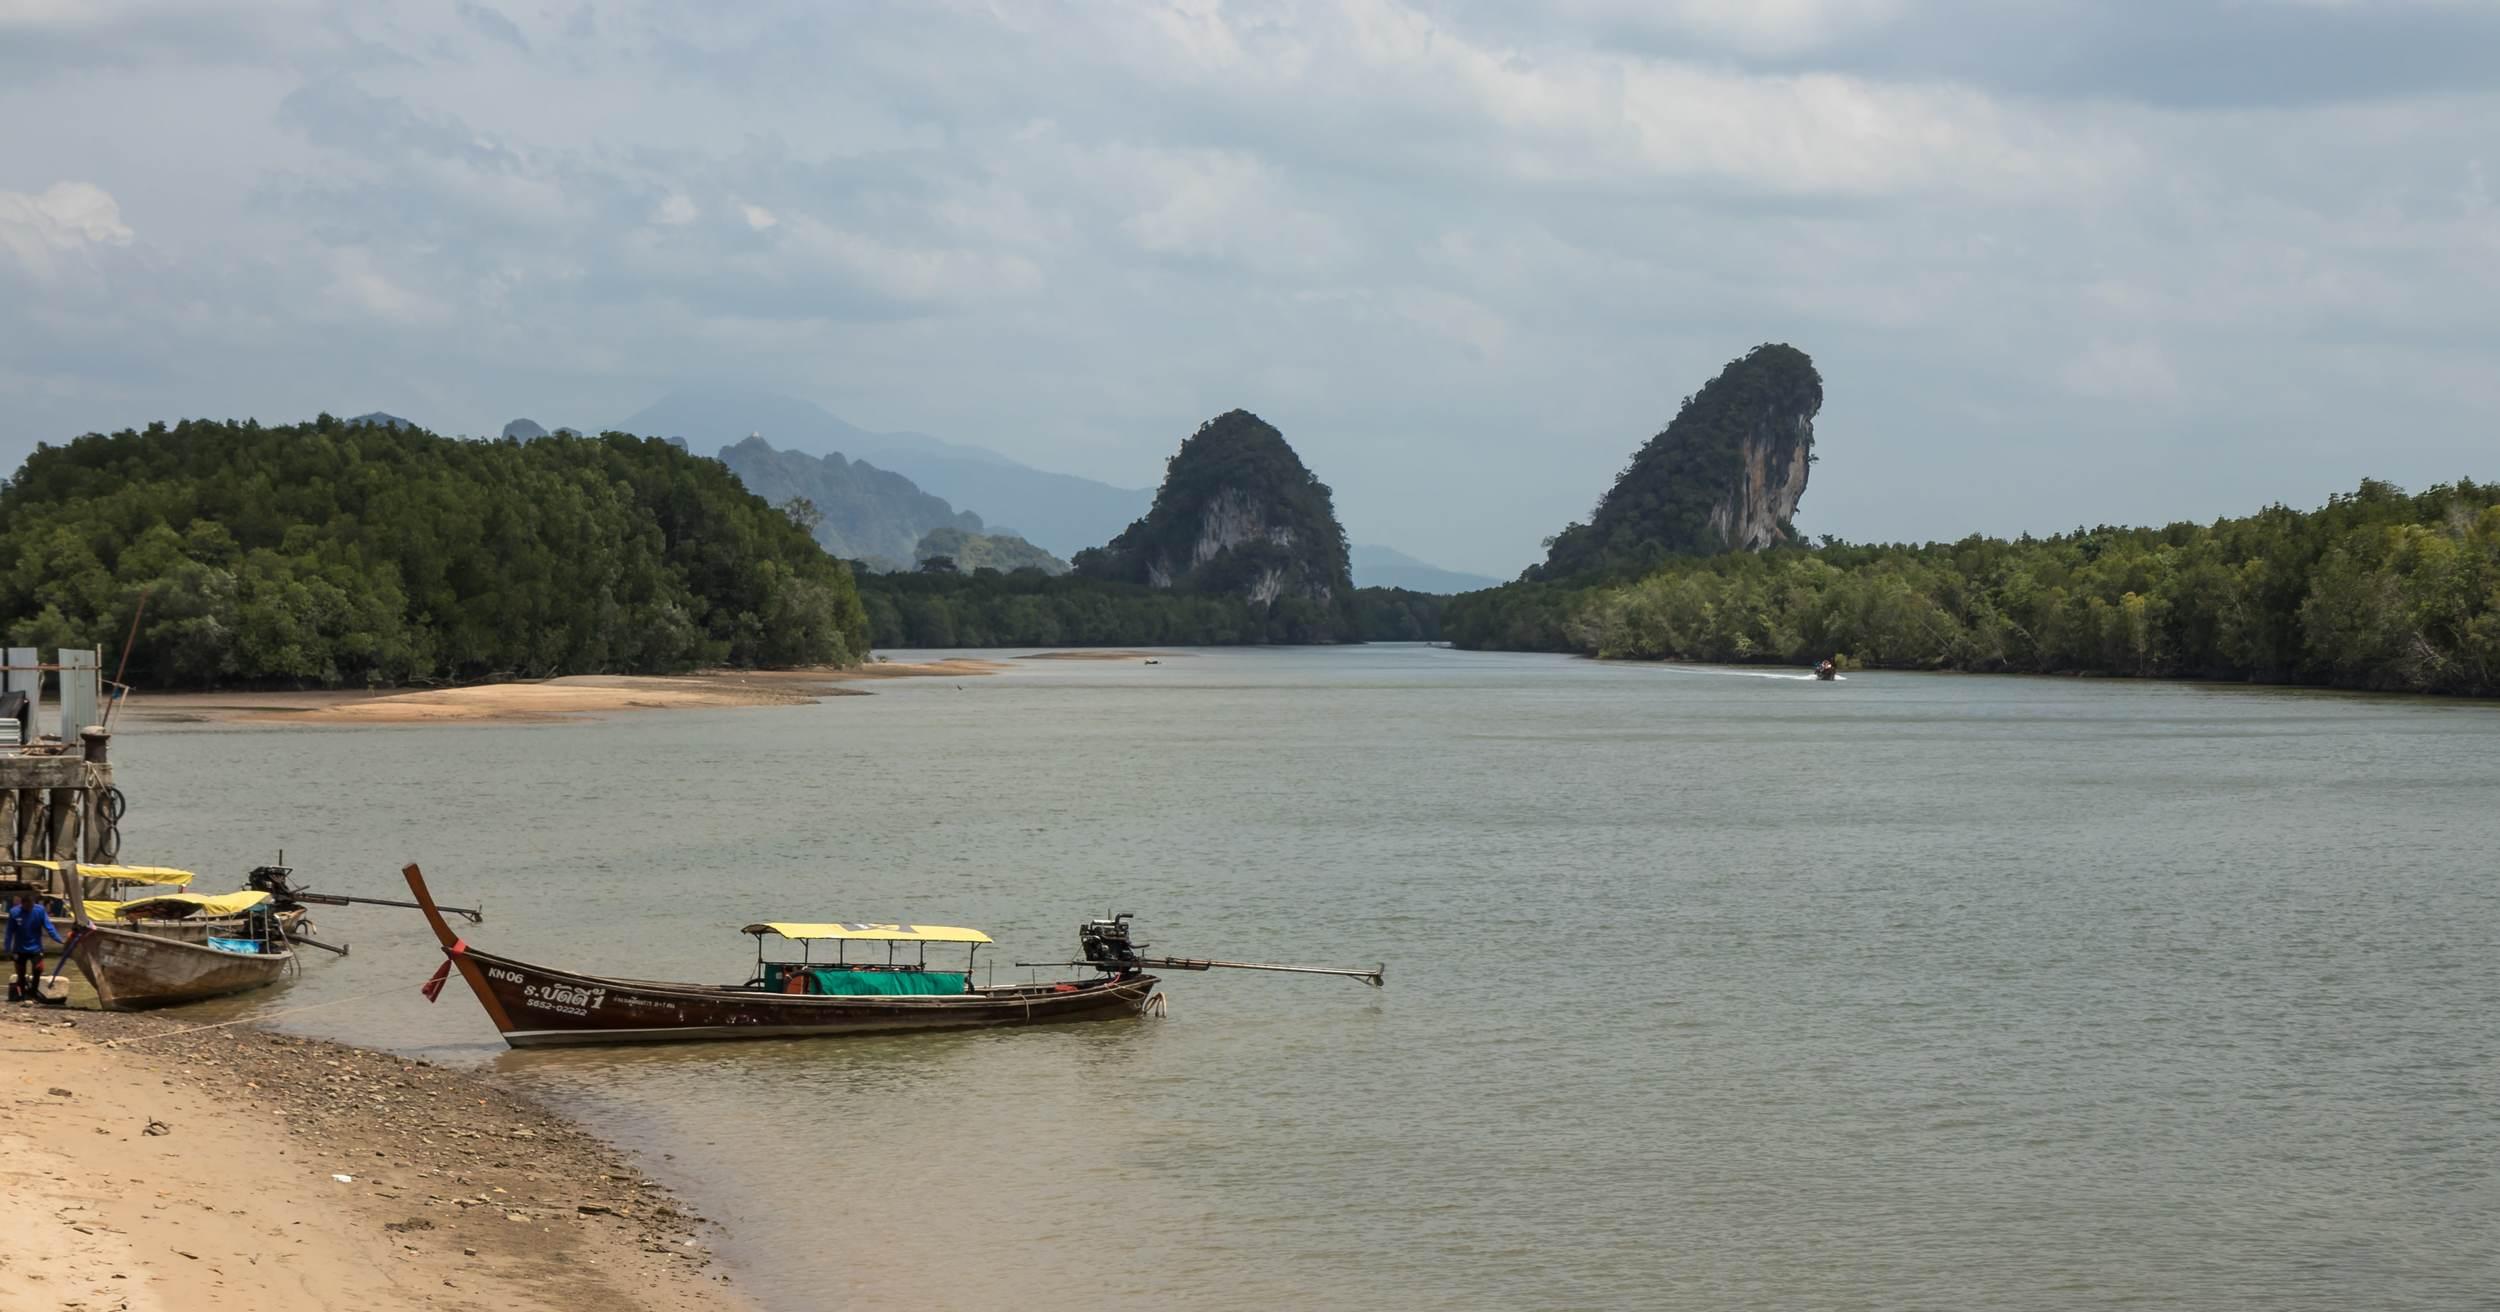 The Khao Khanab Nam Mountains